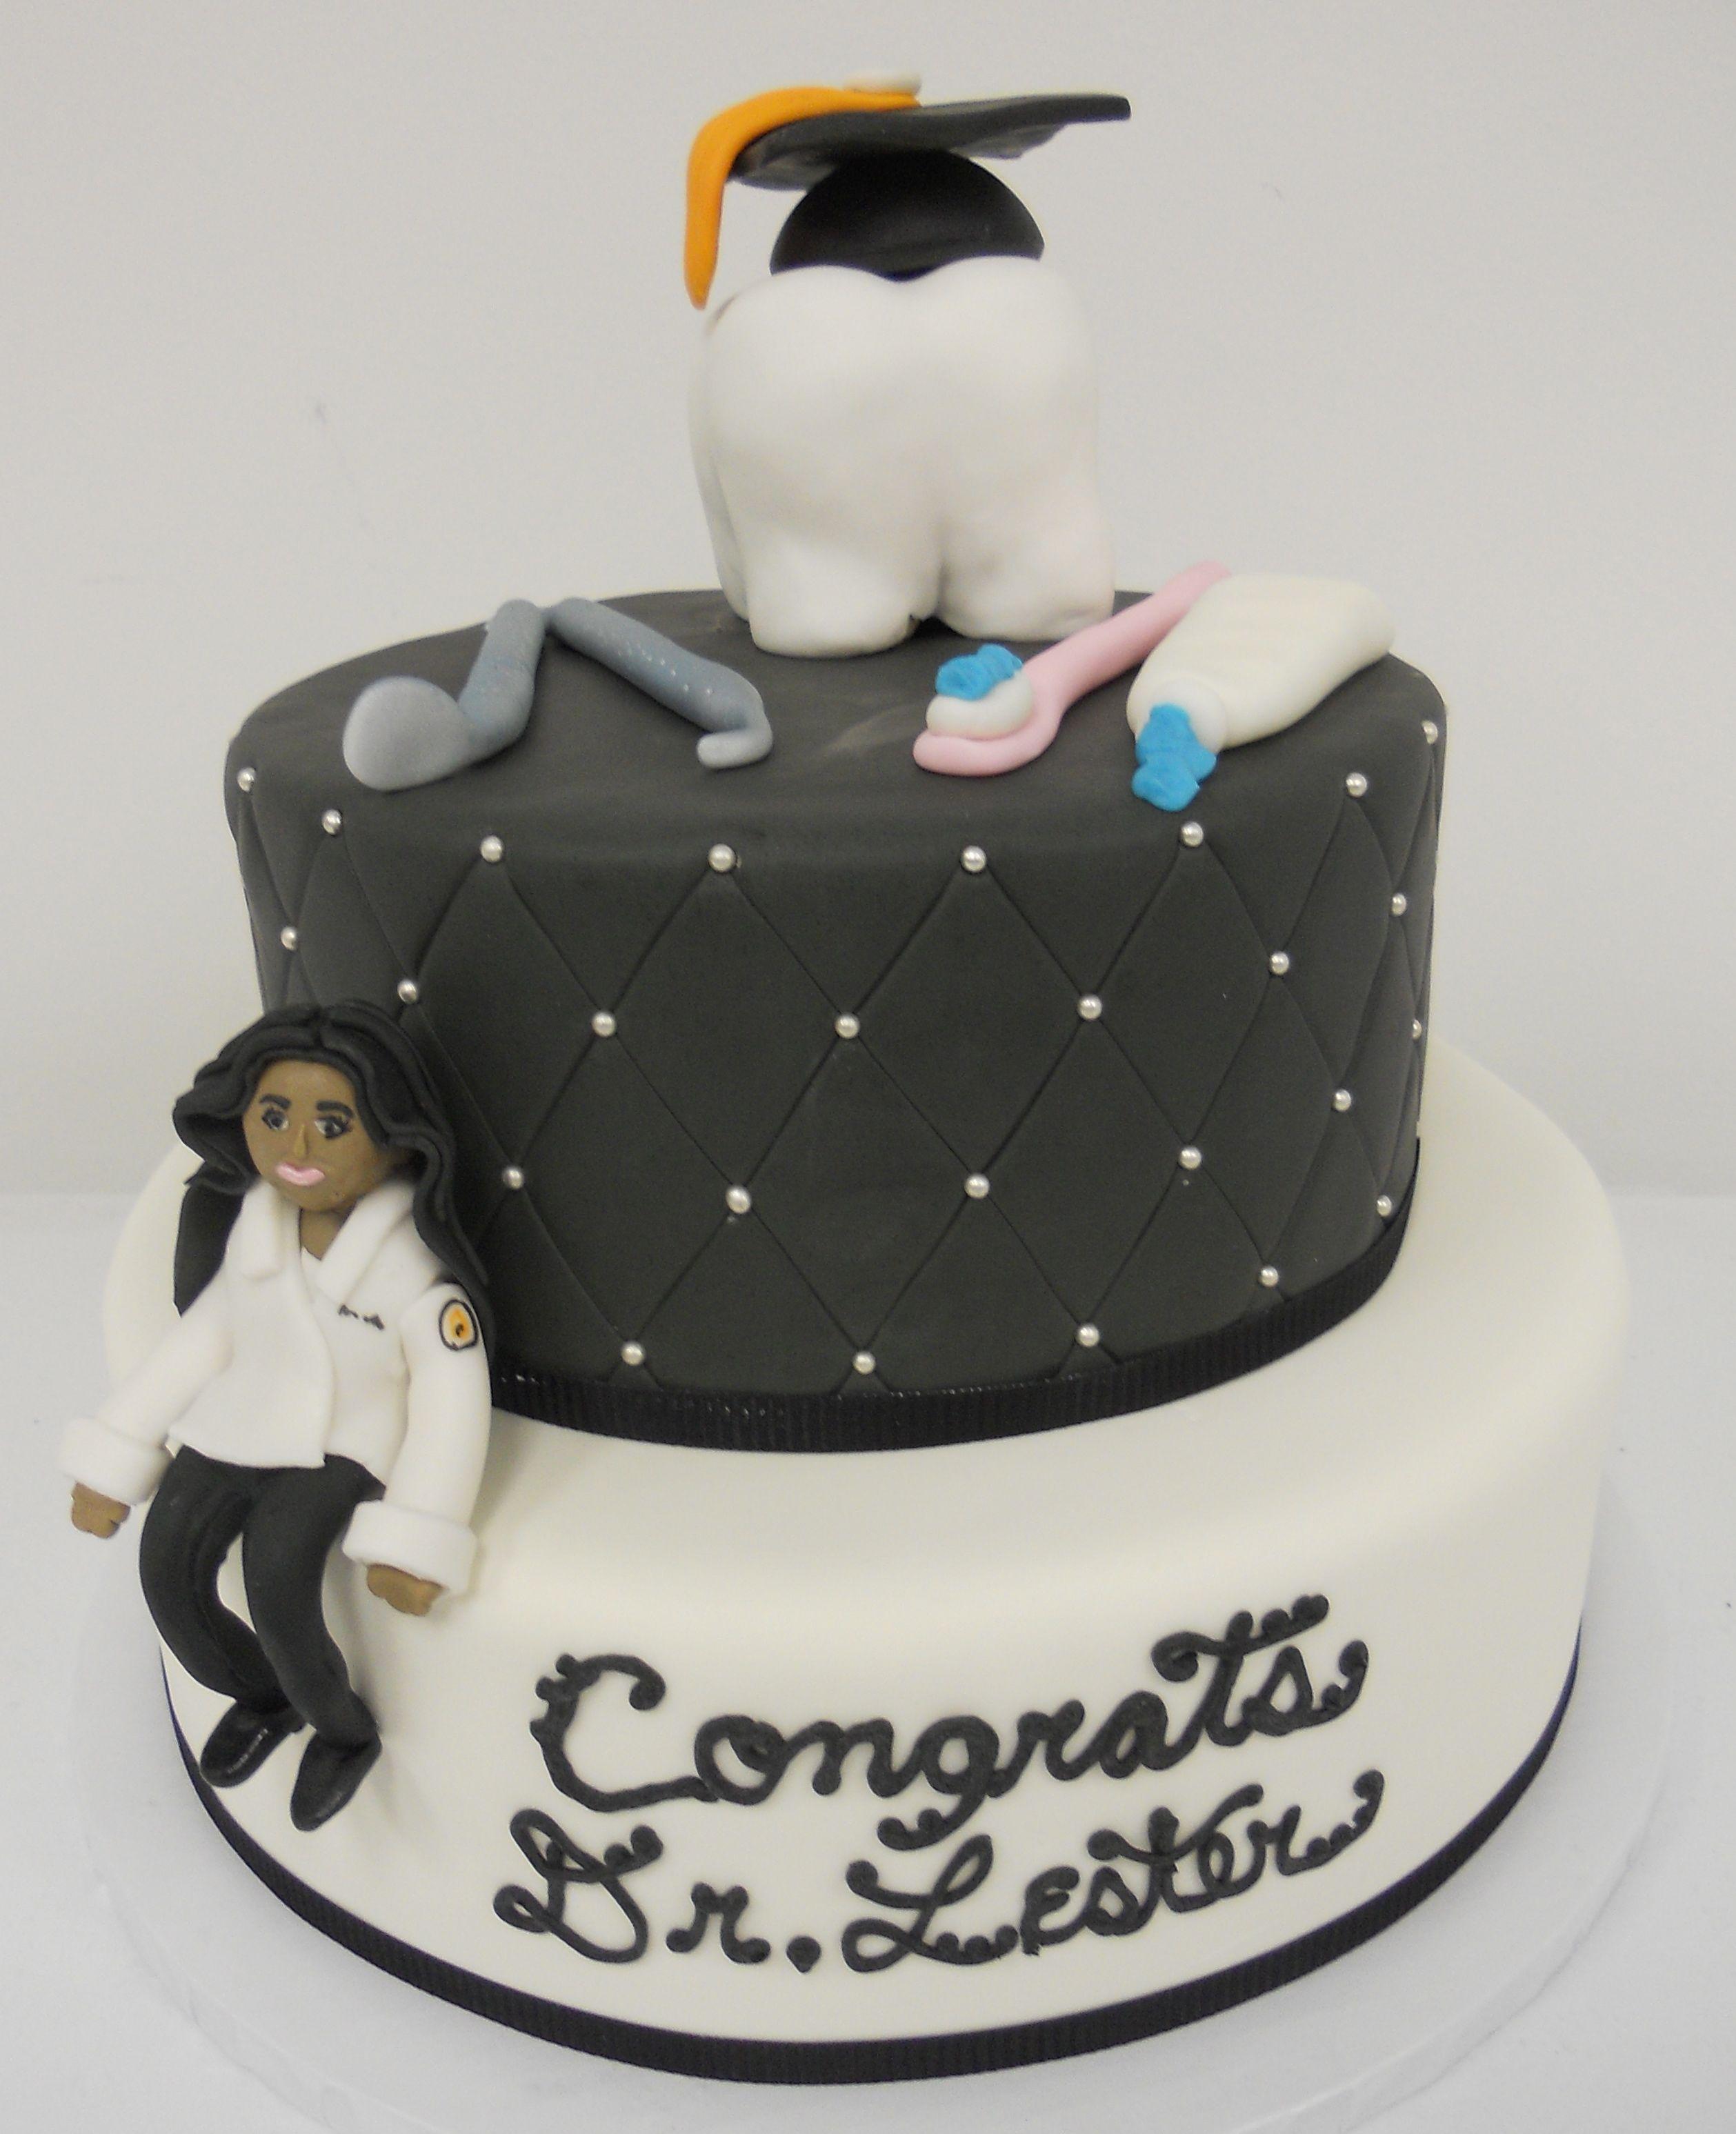 Custom Party Cakes   Memphis custom cake bakery   Special event cakes,  Cake, Party cakes